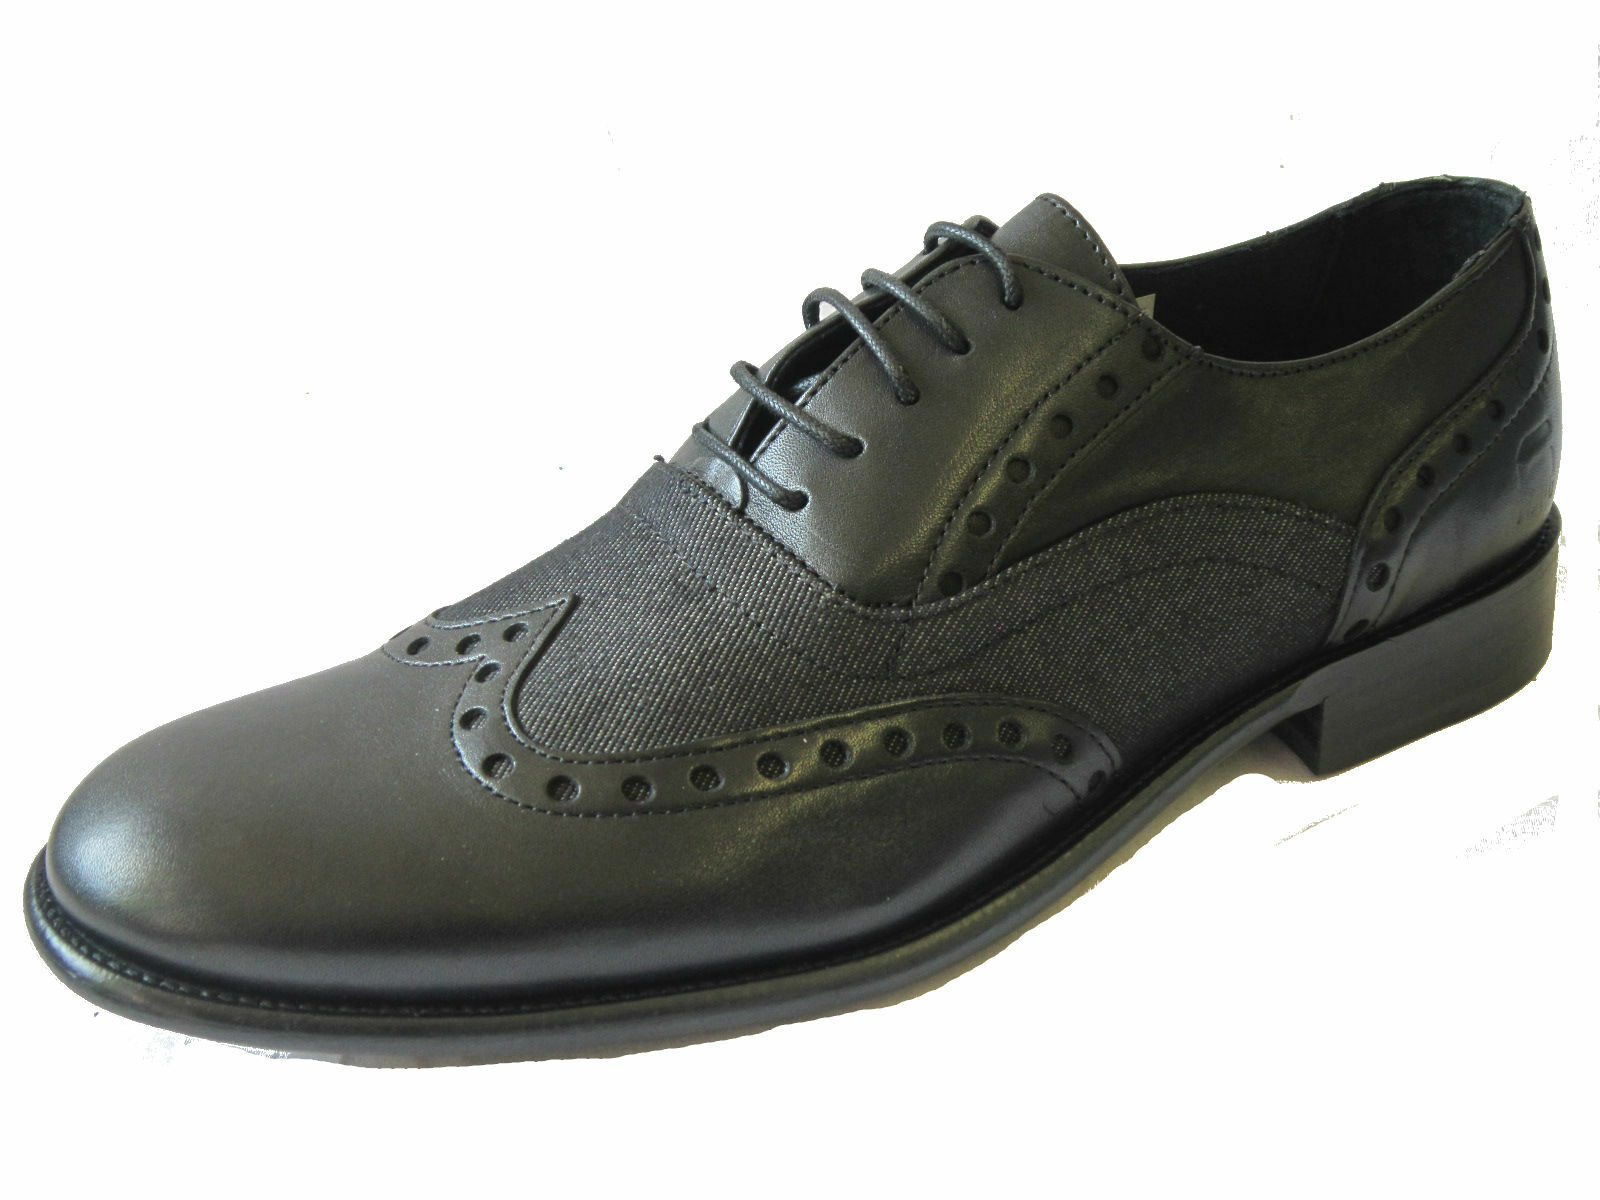 Para Hombre G-star Raw Negro leather/denim los zapatos